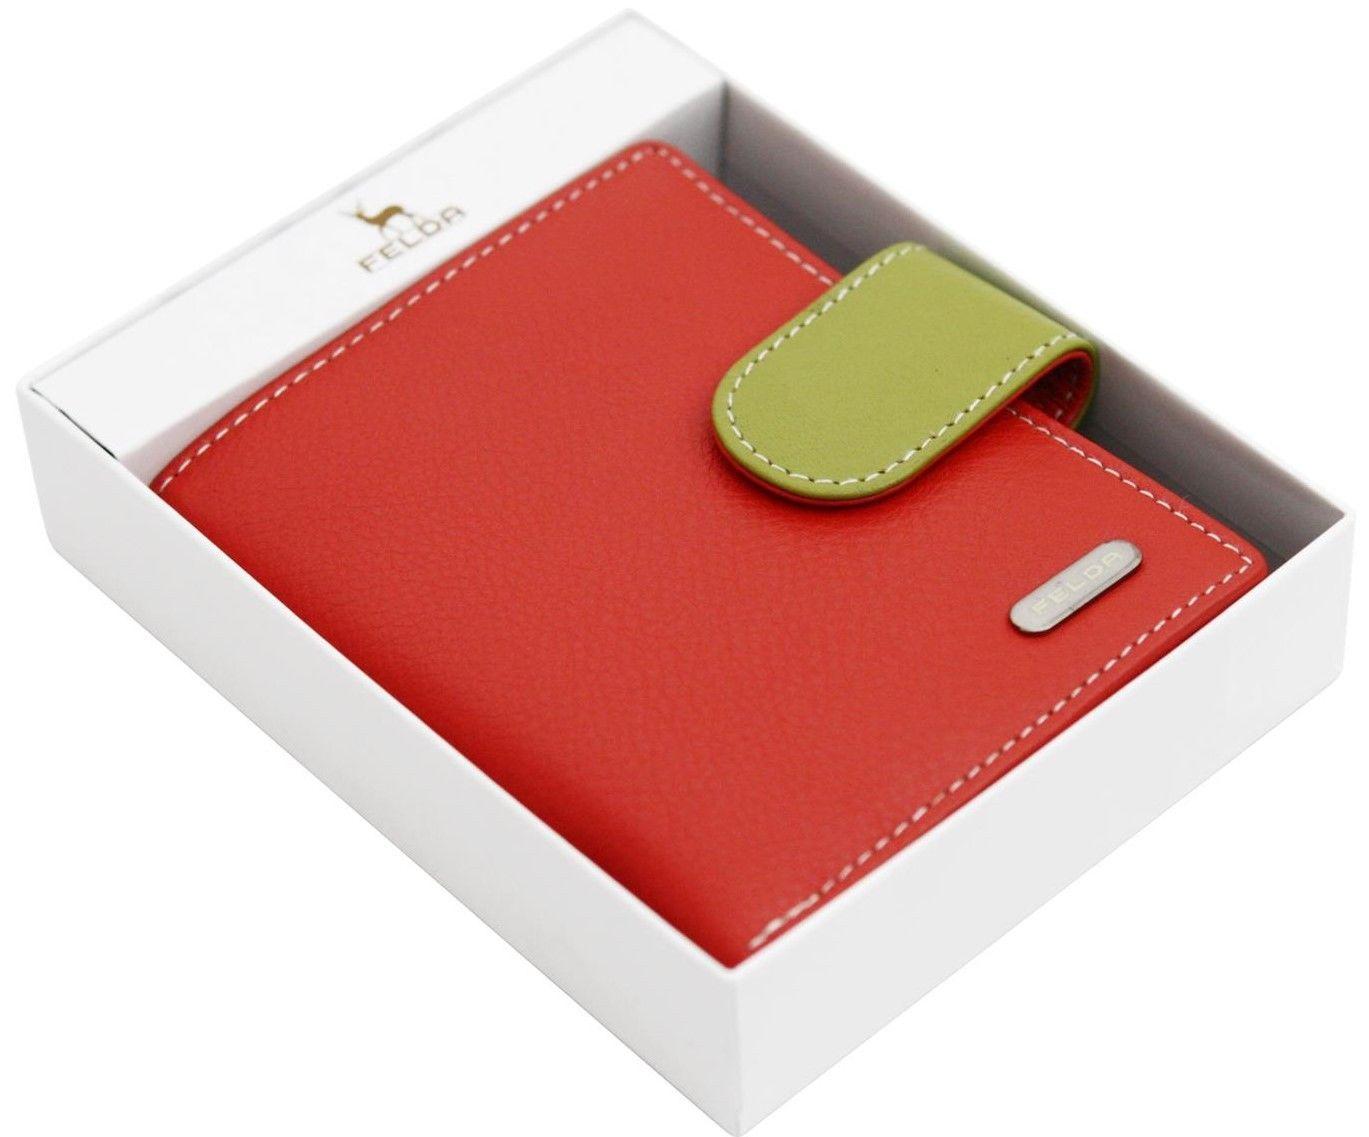 Felda-RFID-onorevoli-MEDAGLIA-amp-Card-Purse-Wallet-Genuine-Leather-Multi-SOFT-BOX-REGALO miniatura 72